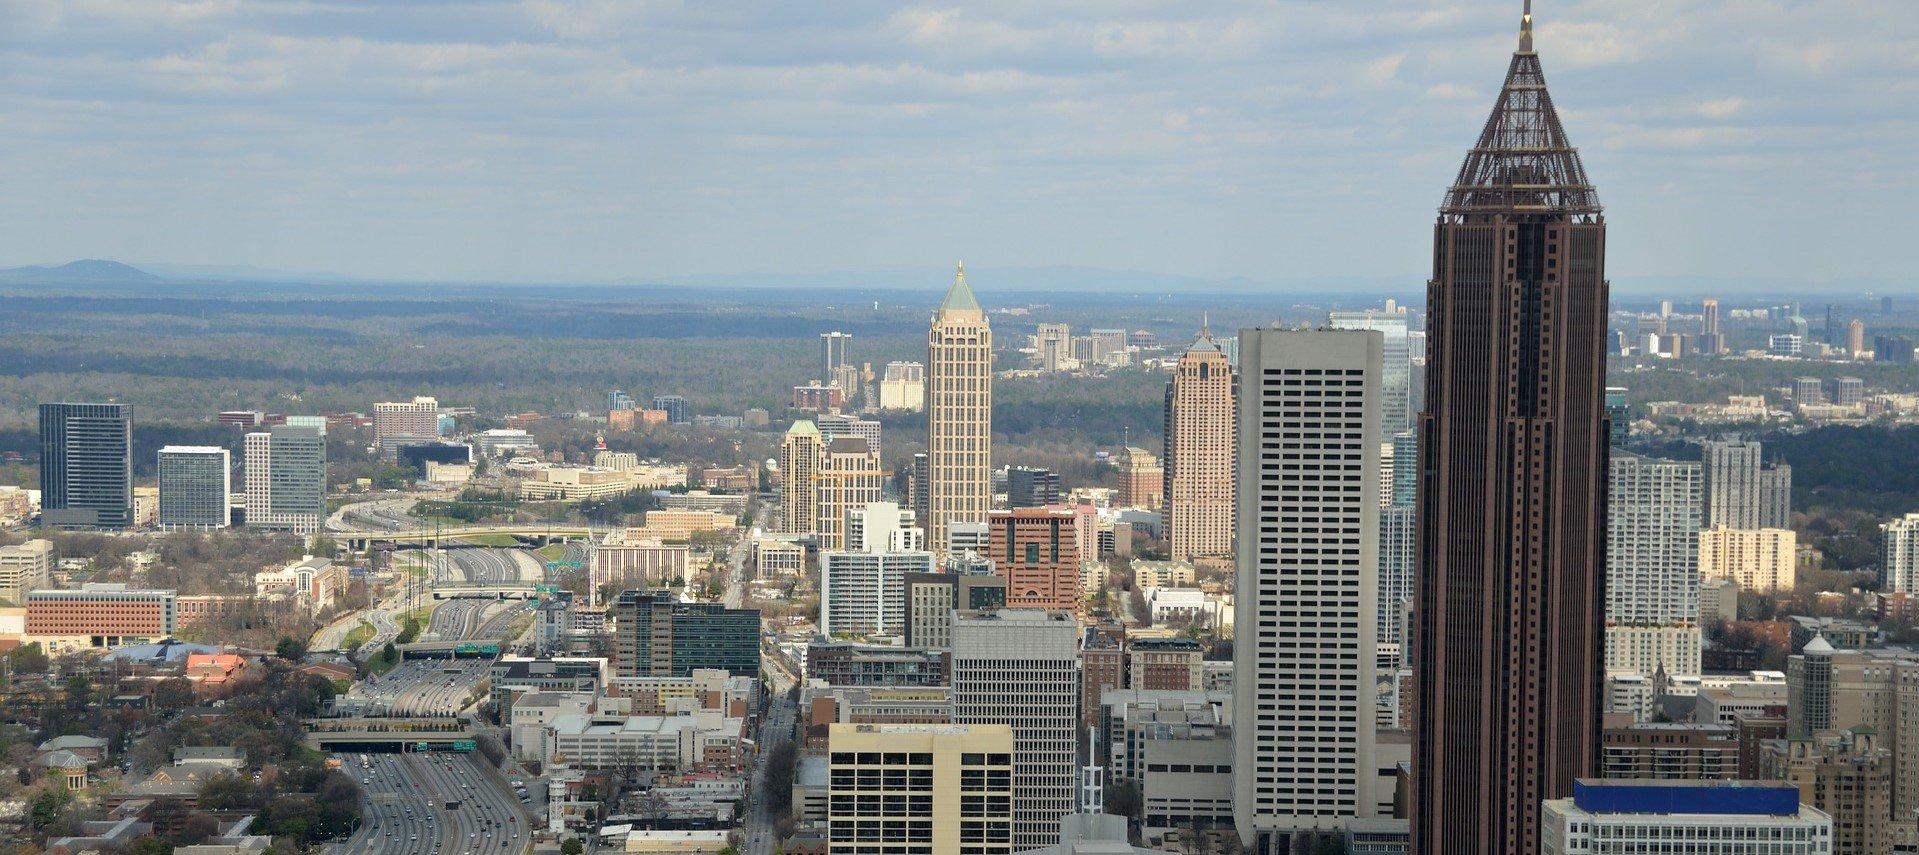 Aerial View of Downtown Atlanta - VeteranCarDonations.org